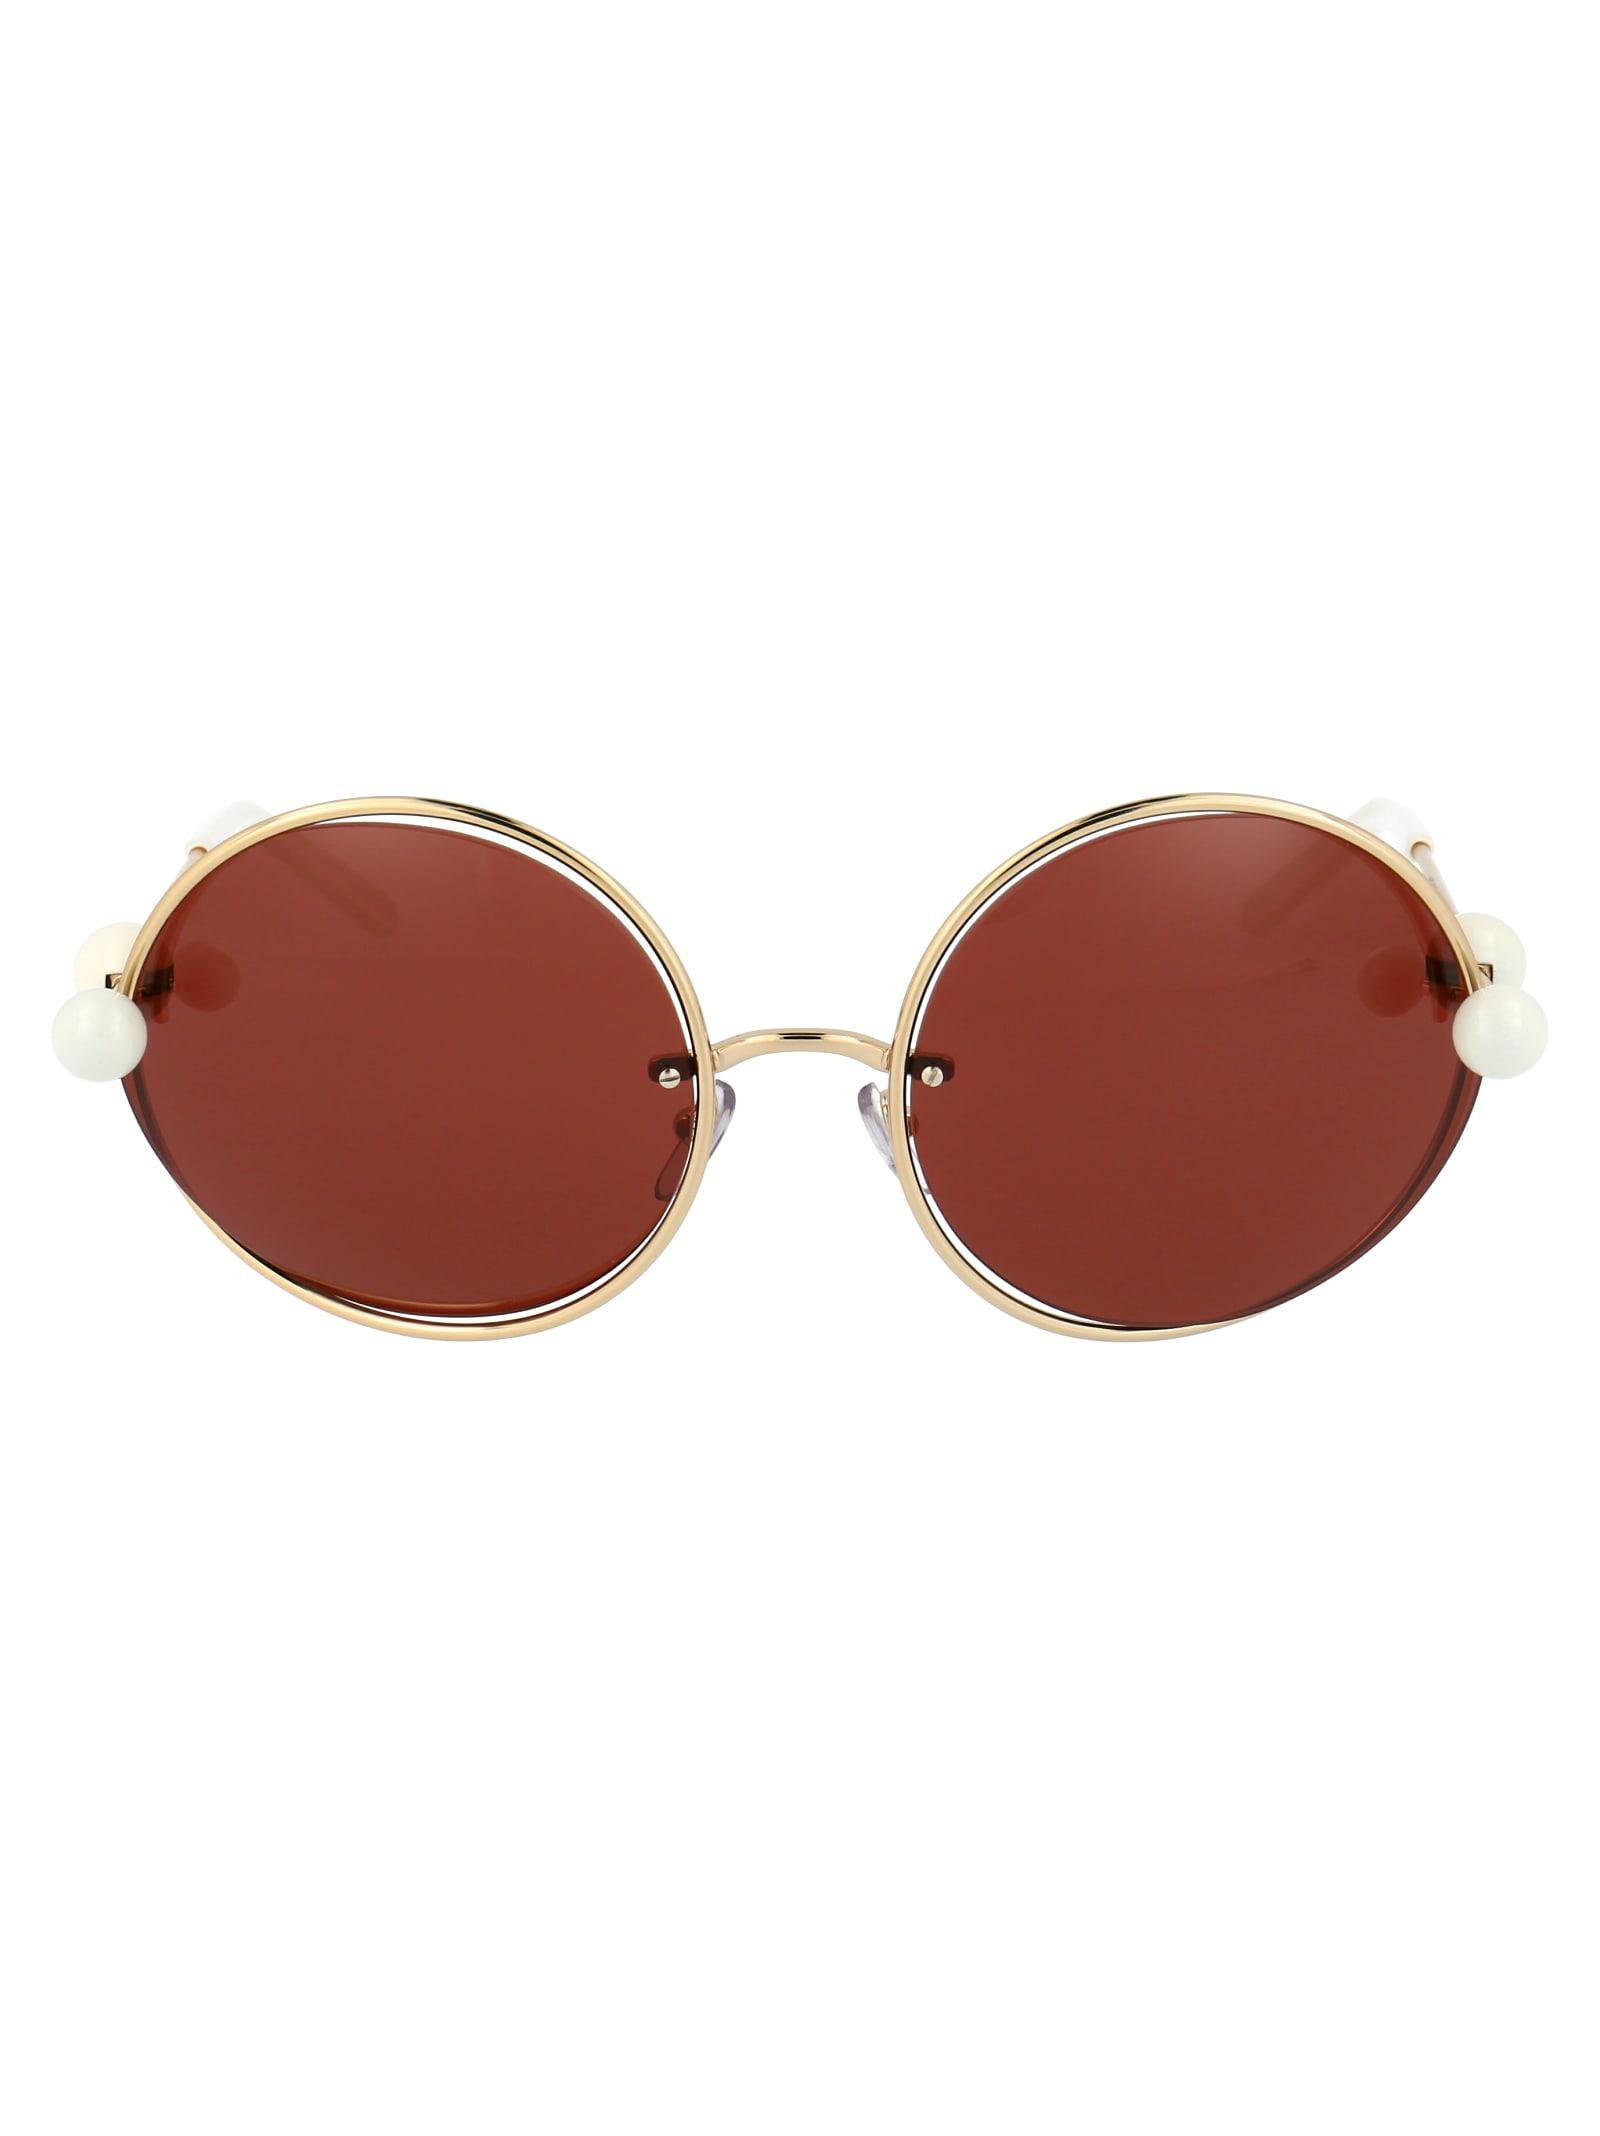 Marni Me106s Sunglasses